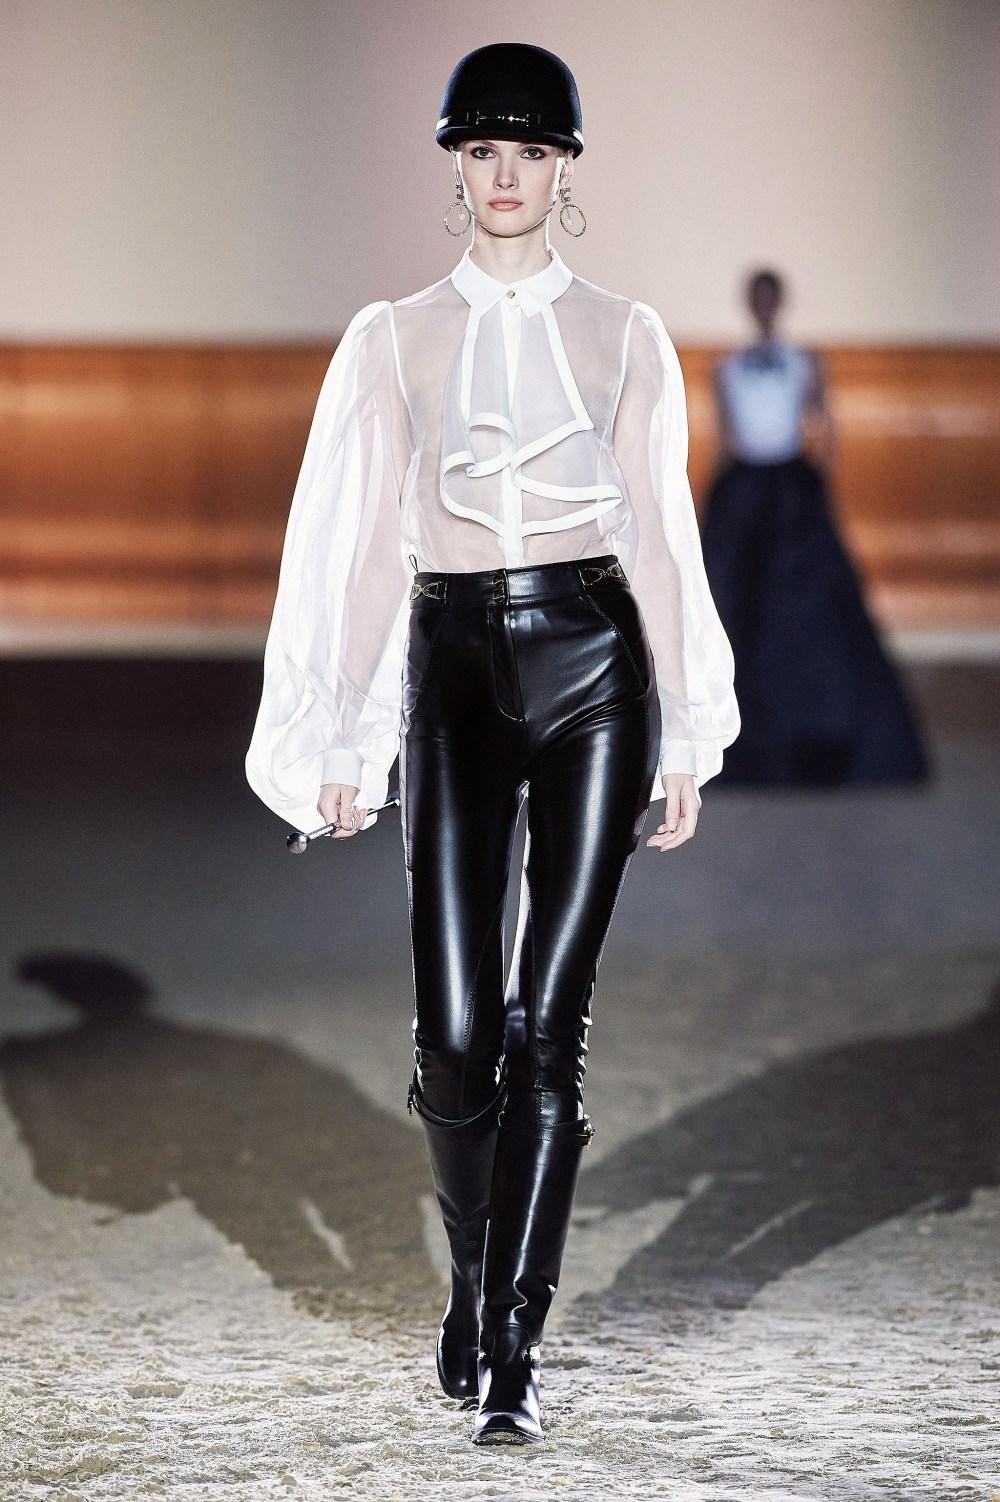 Elisabetta Franchi: Elisabetta Franchi Fall Winter 2021-22 Fashion Show Photo #59